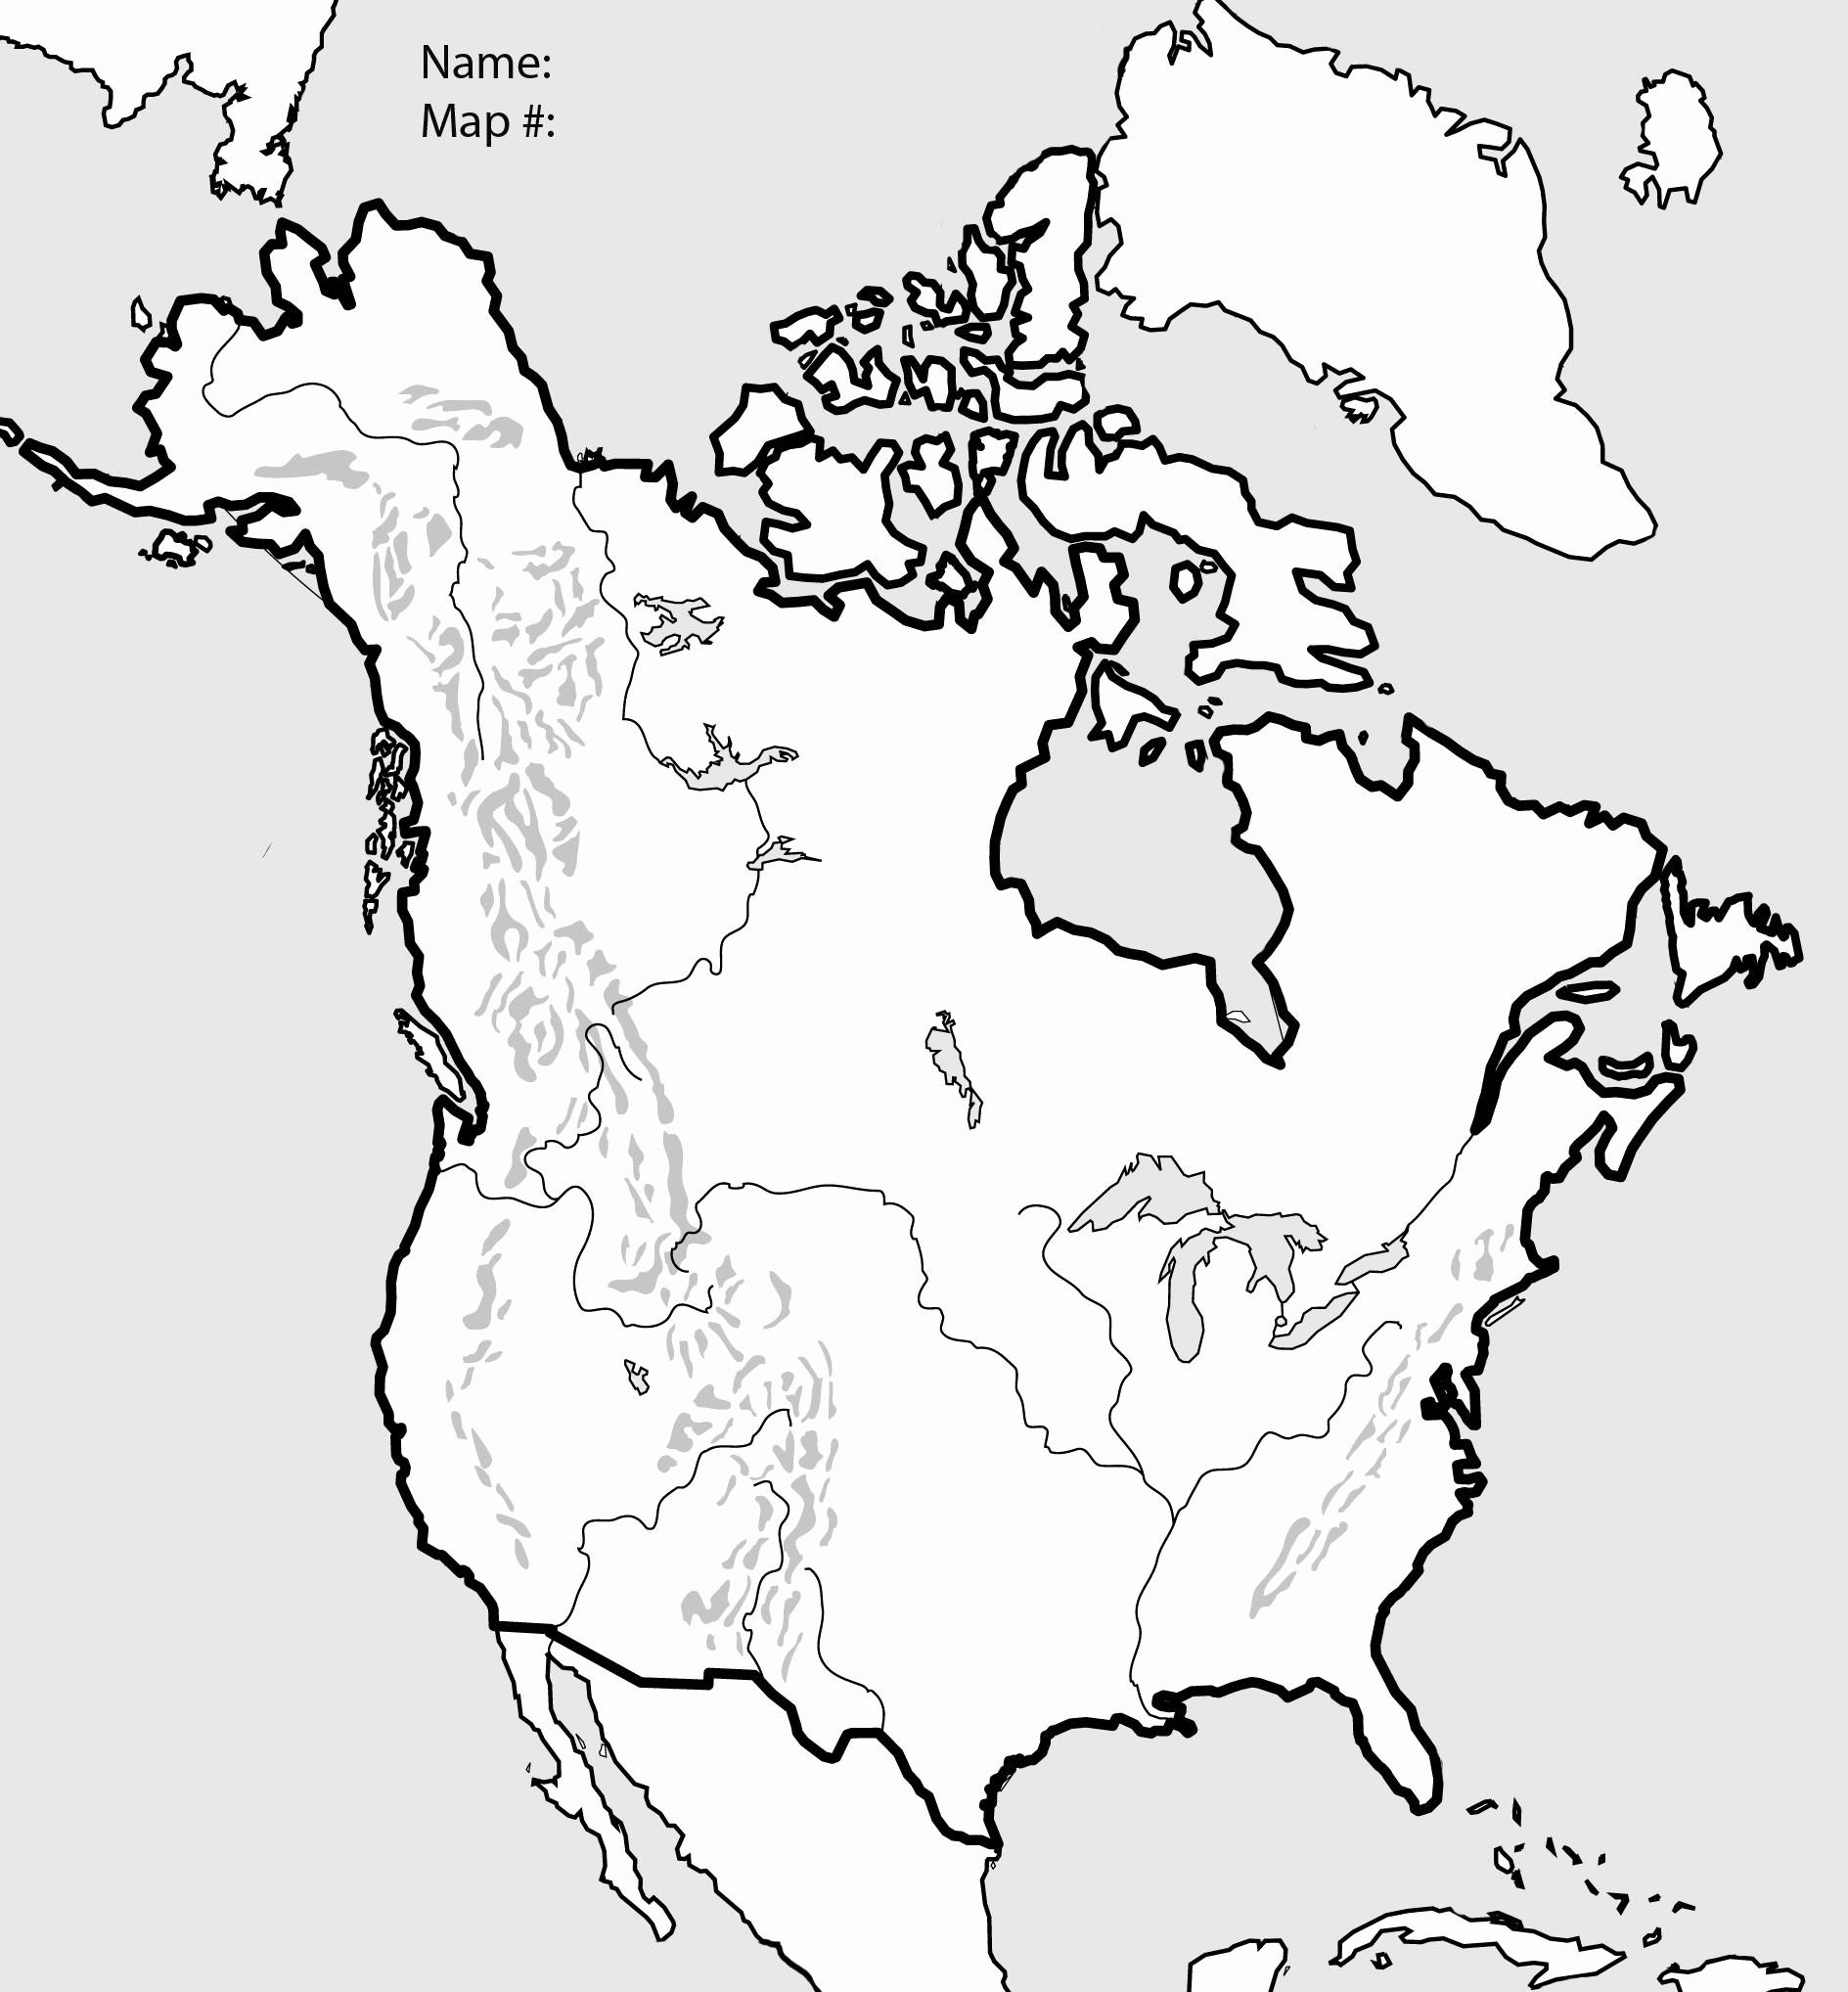 Free Editable Map Of Us Luxury Free Editable Us and Canada Map Marinatower